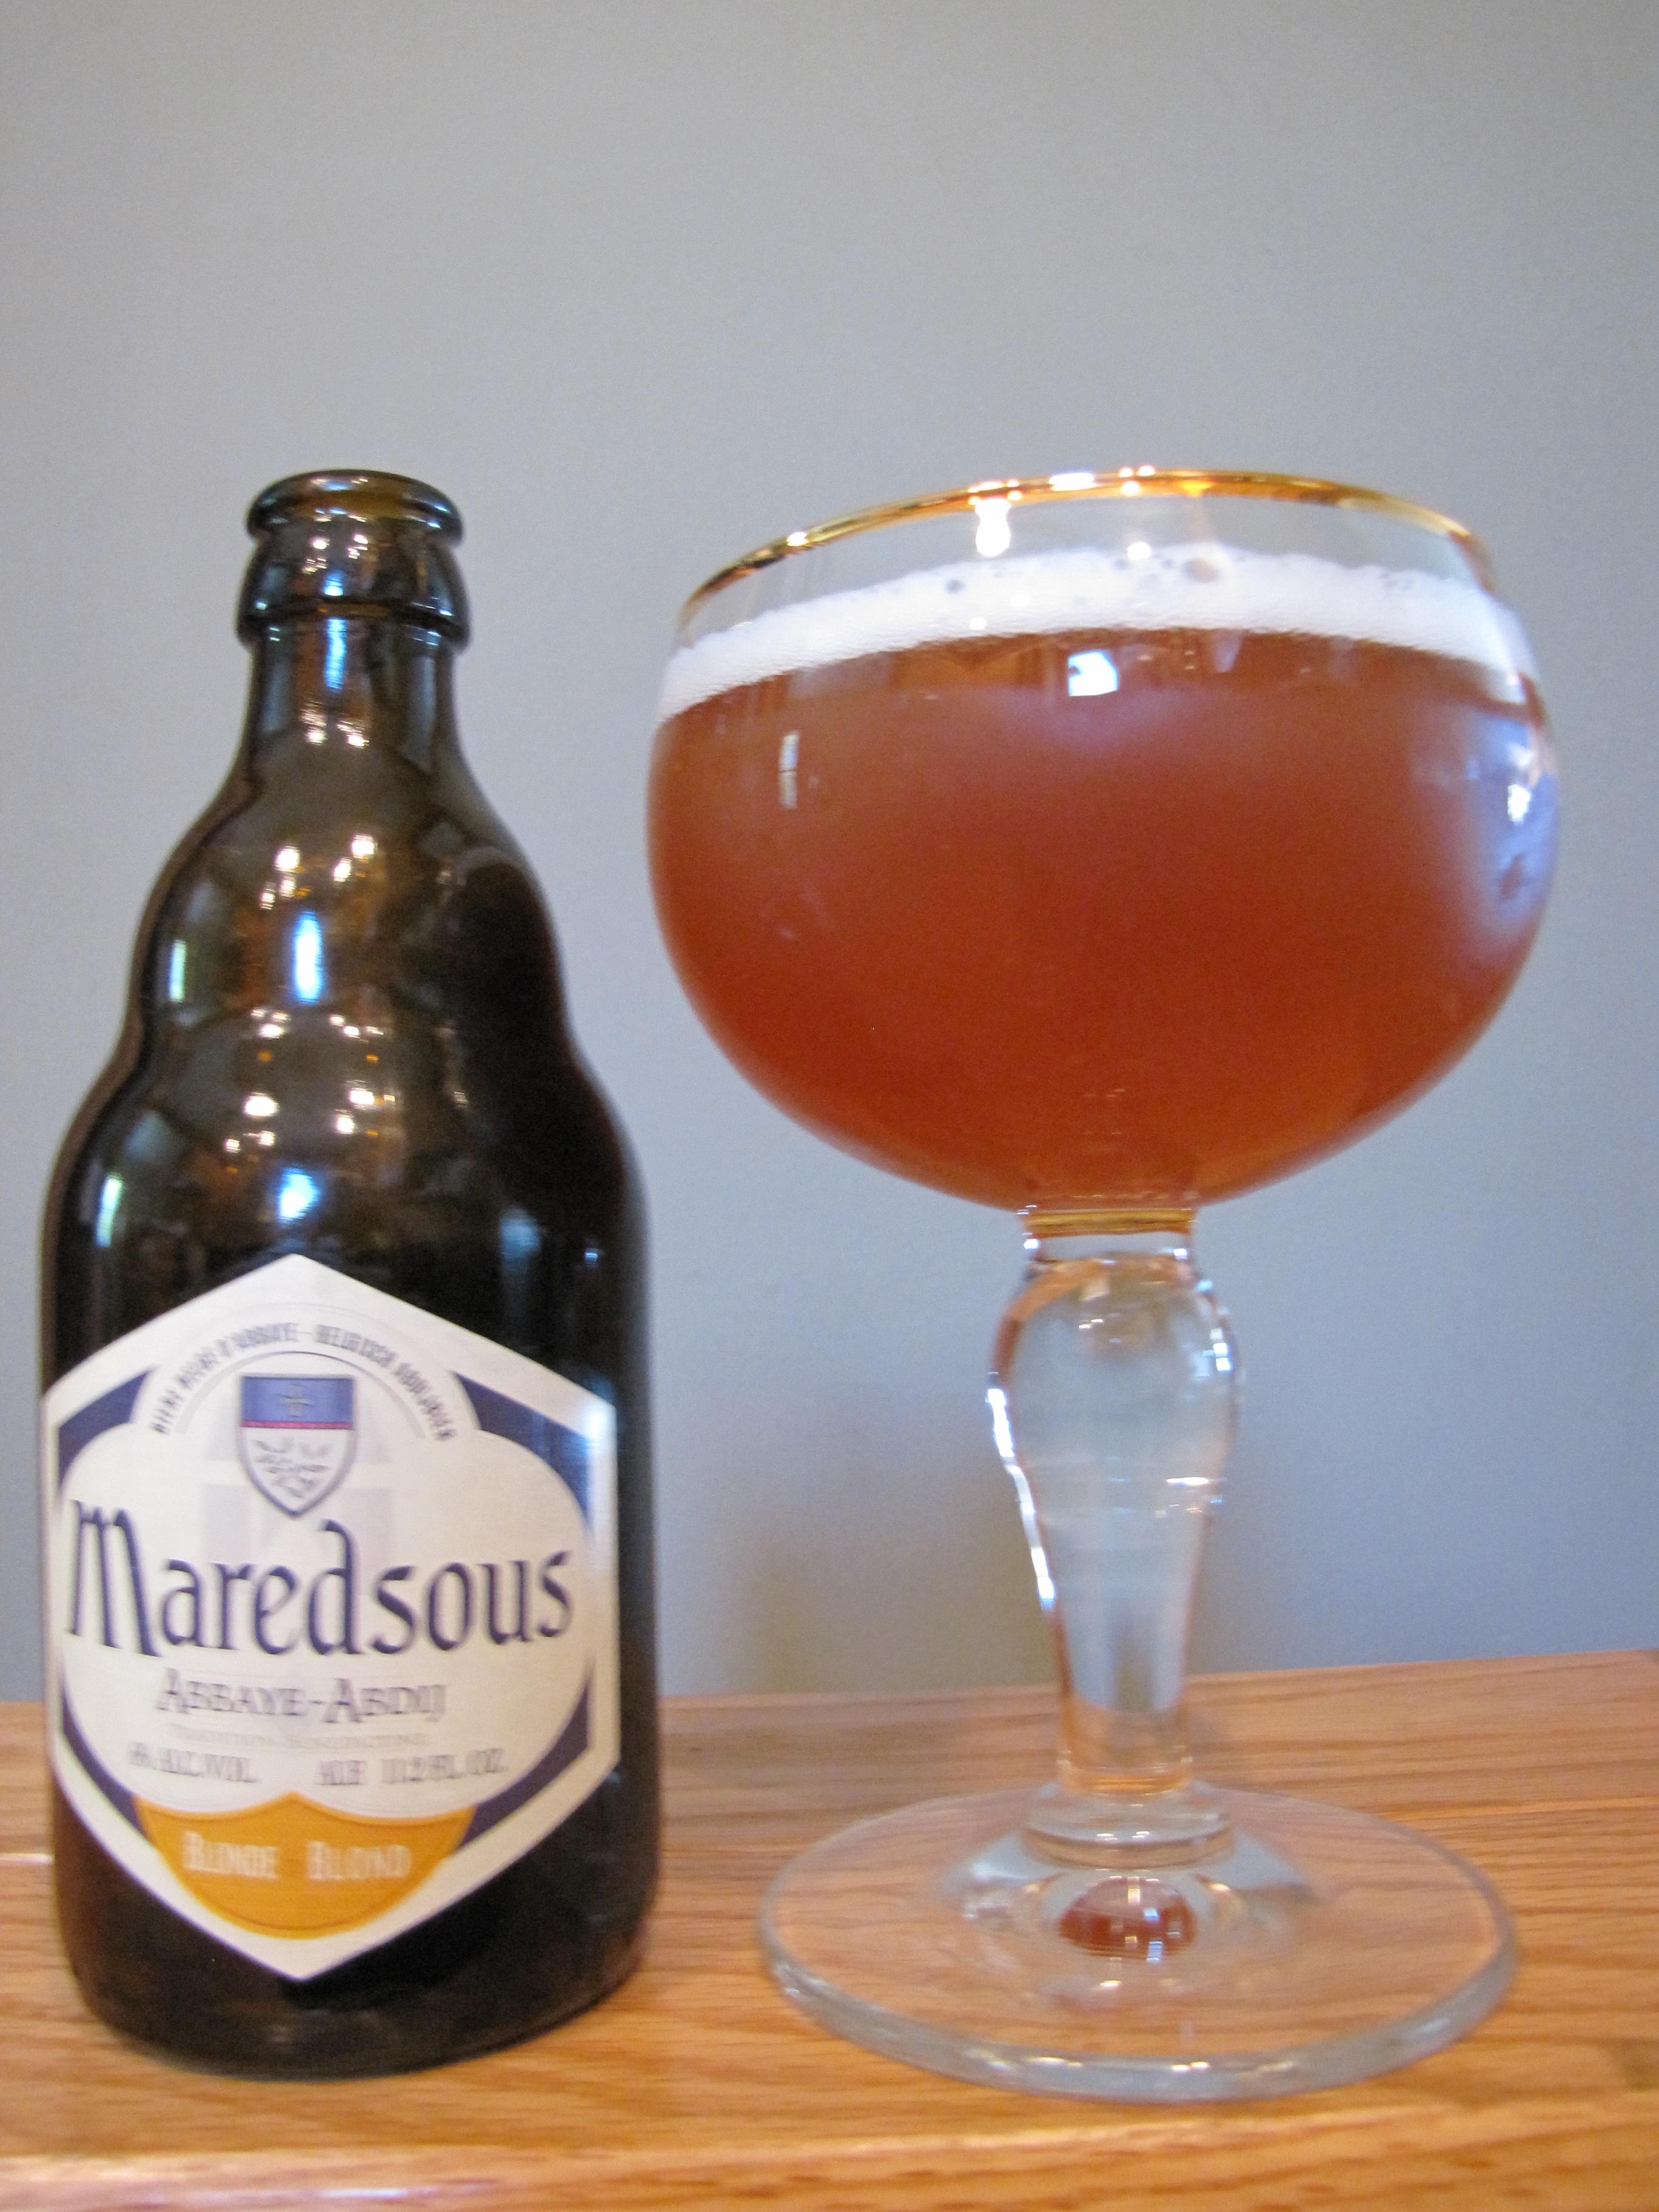 Duvel Maredsous 6 - Blonde